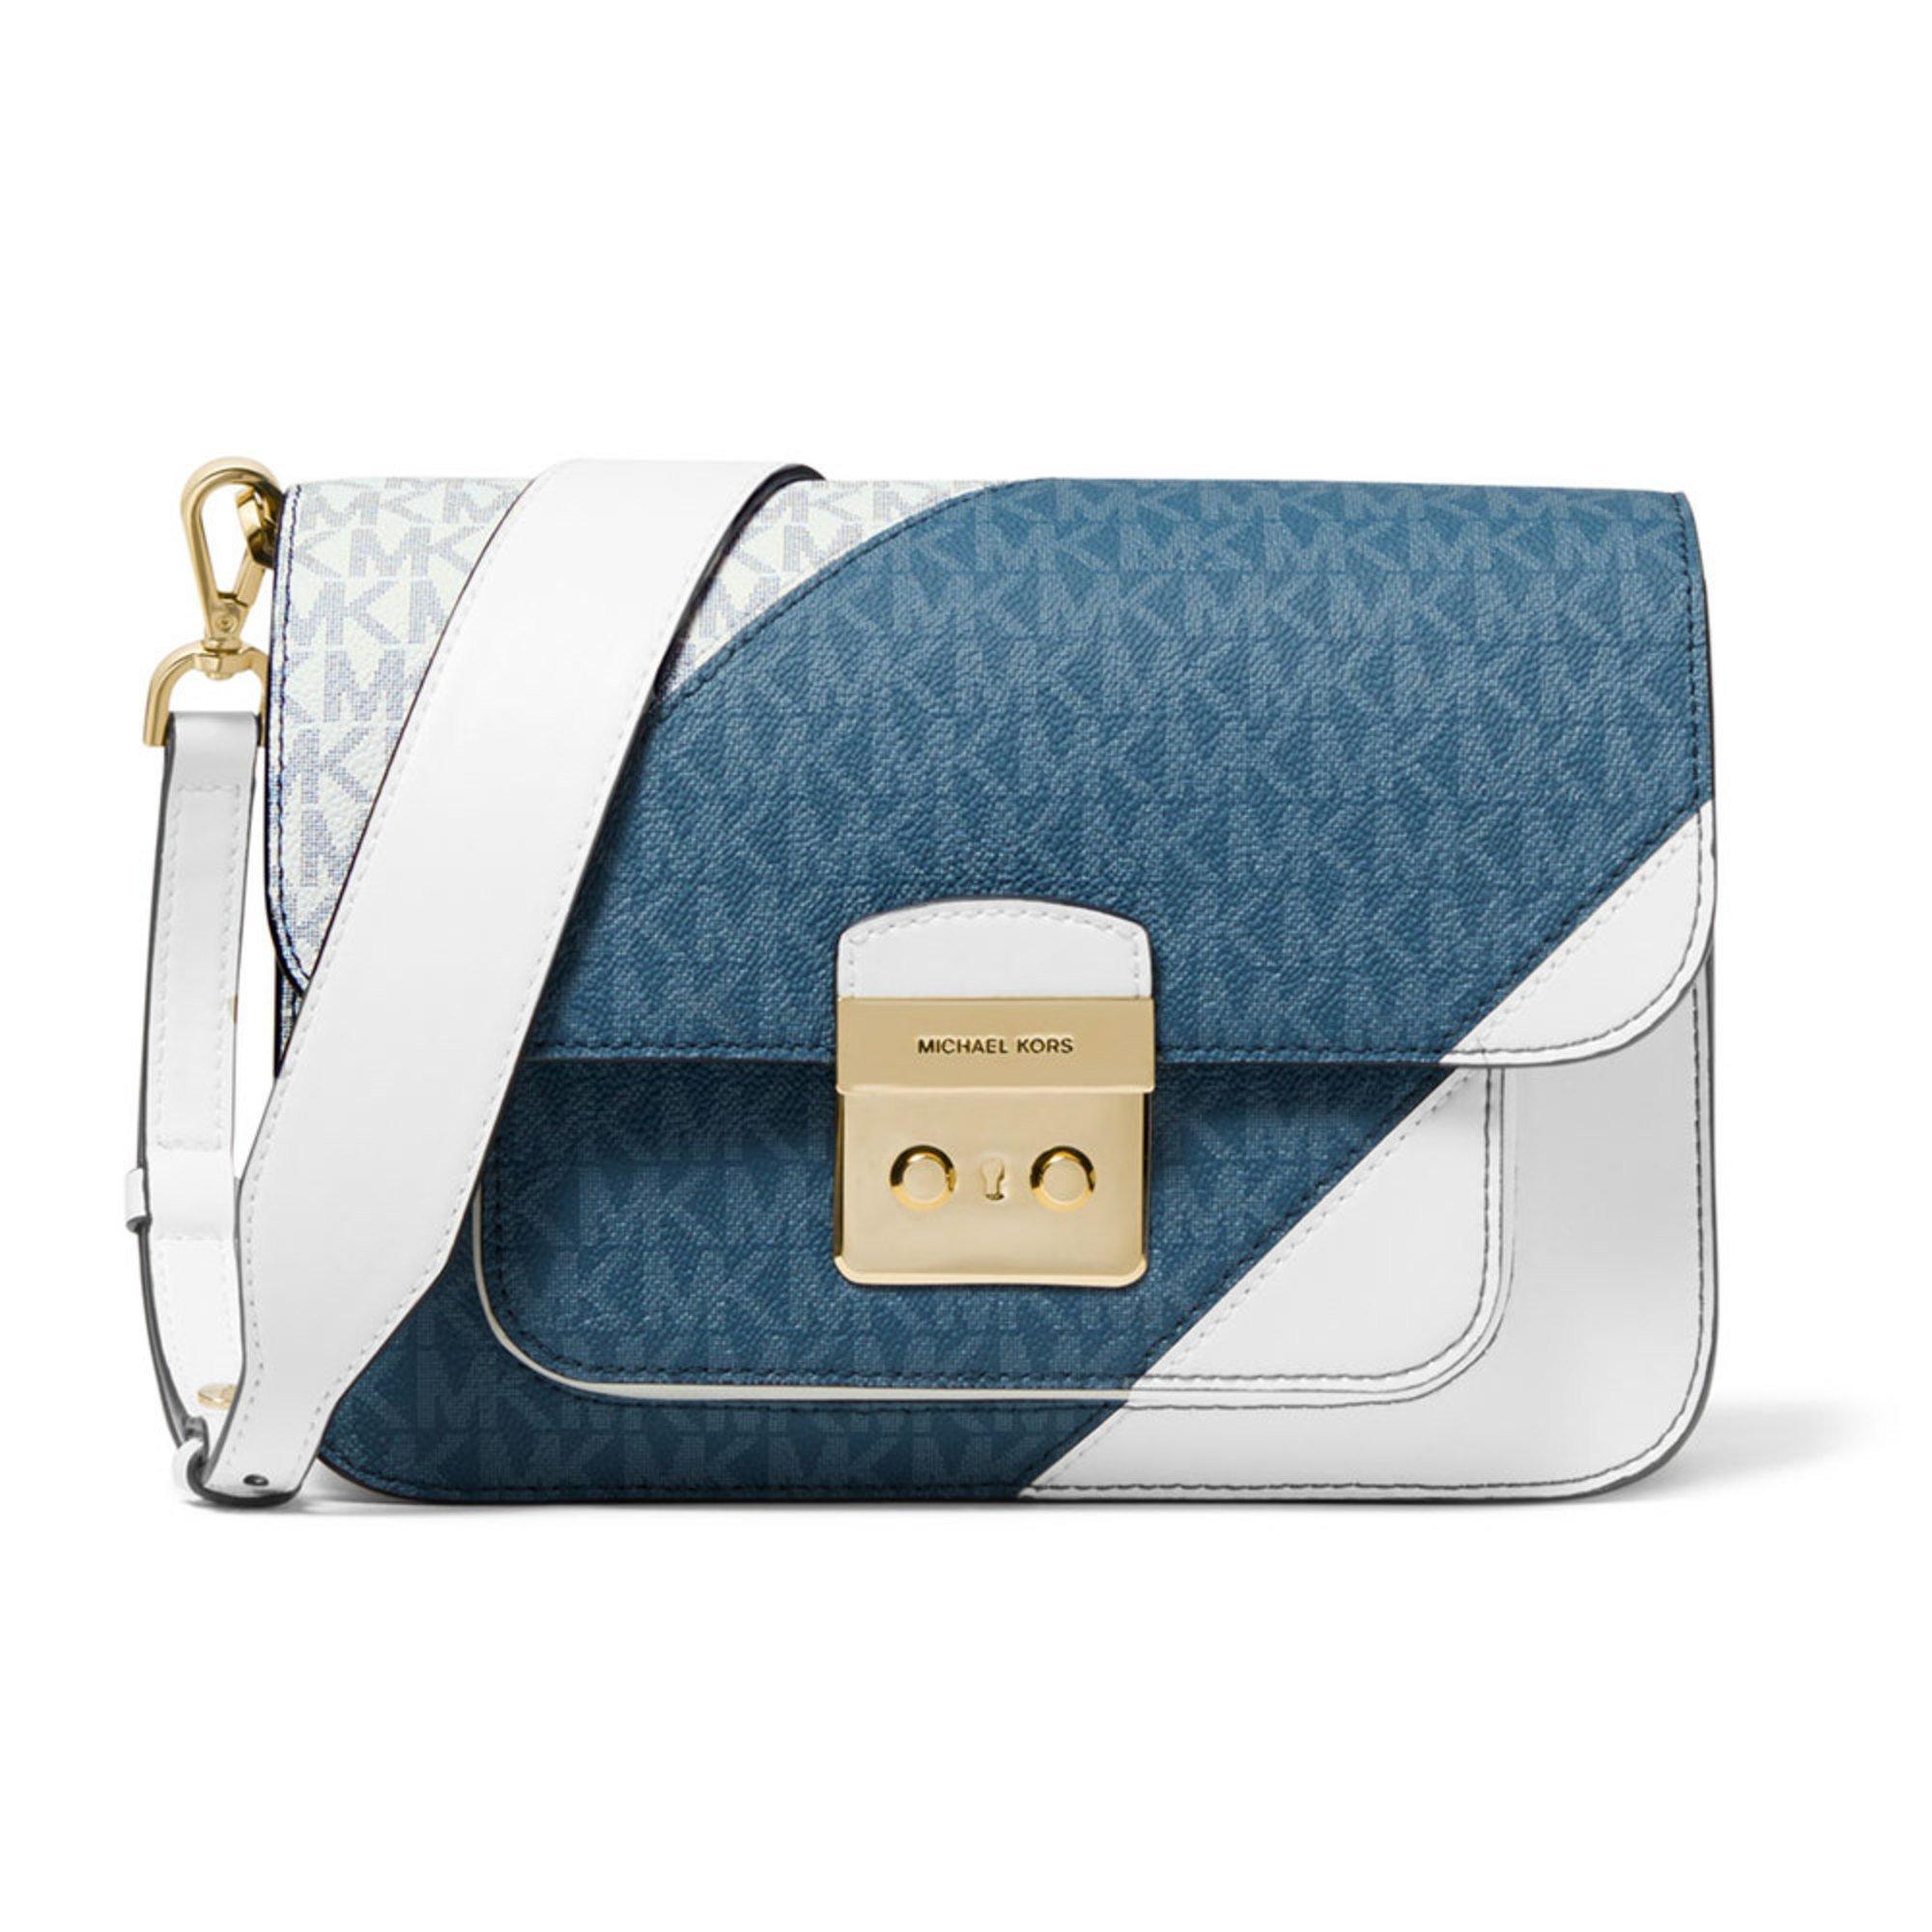 defc7cd597dc Michael Kors Sloan Editor Large Shoulder | Shoulder Bags | Handbags ...